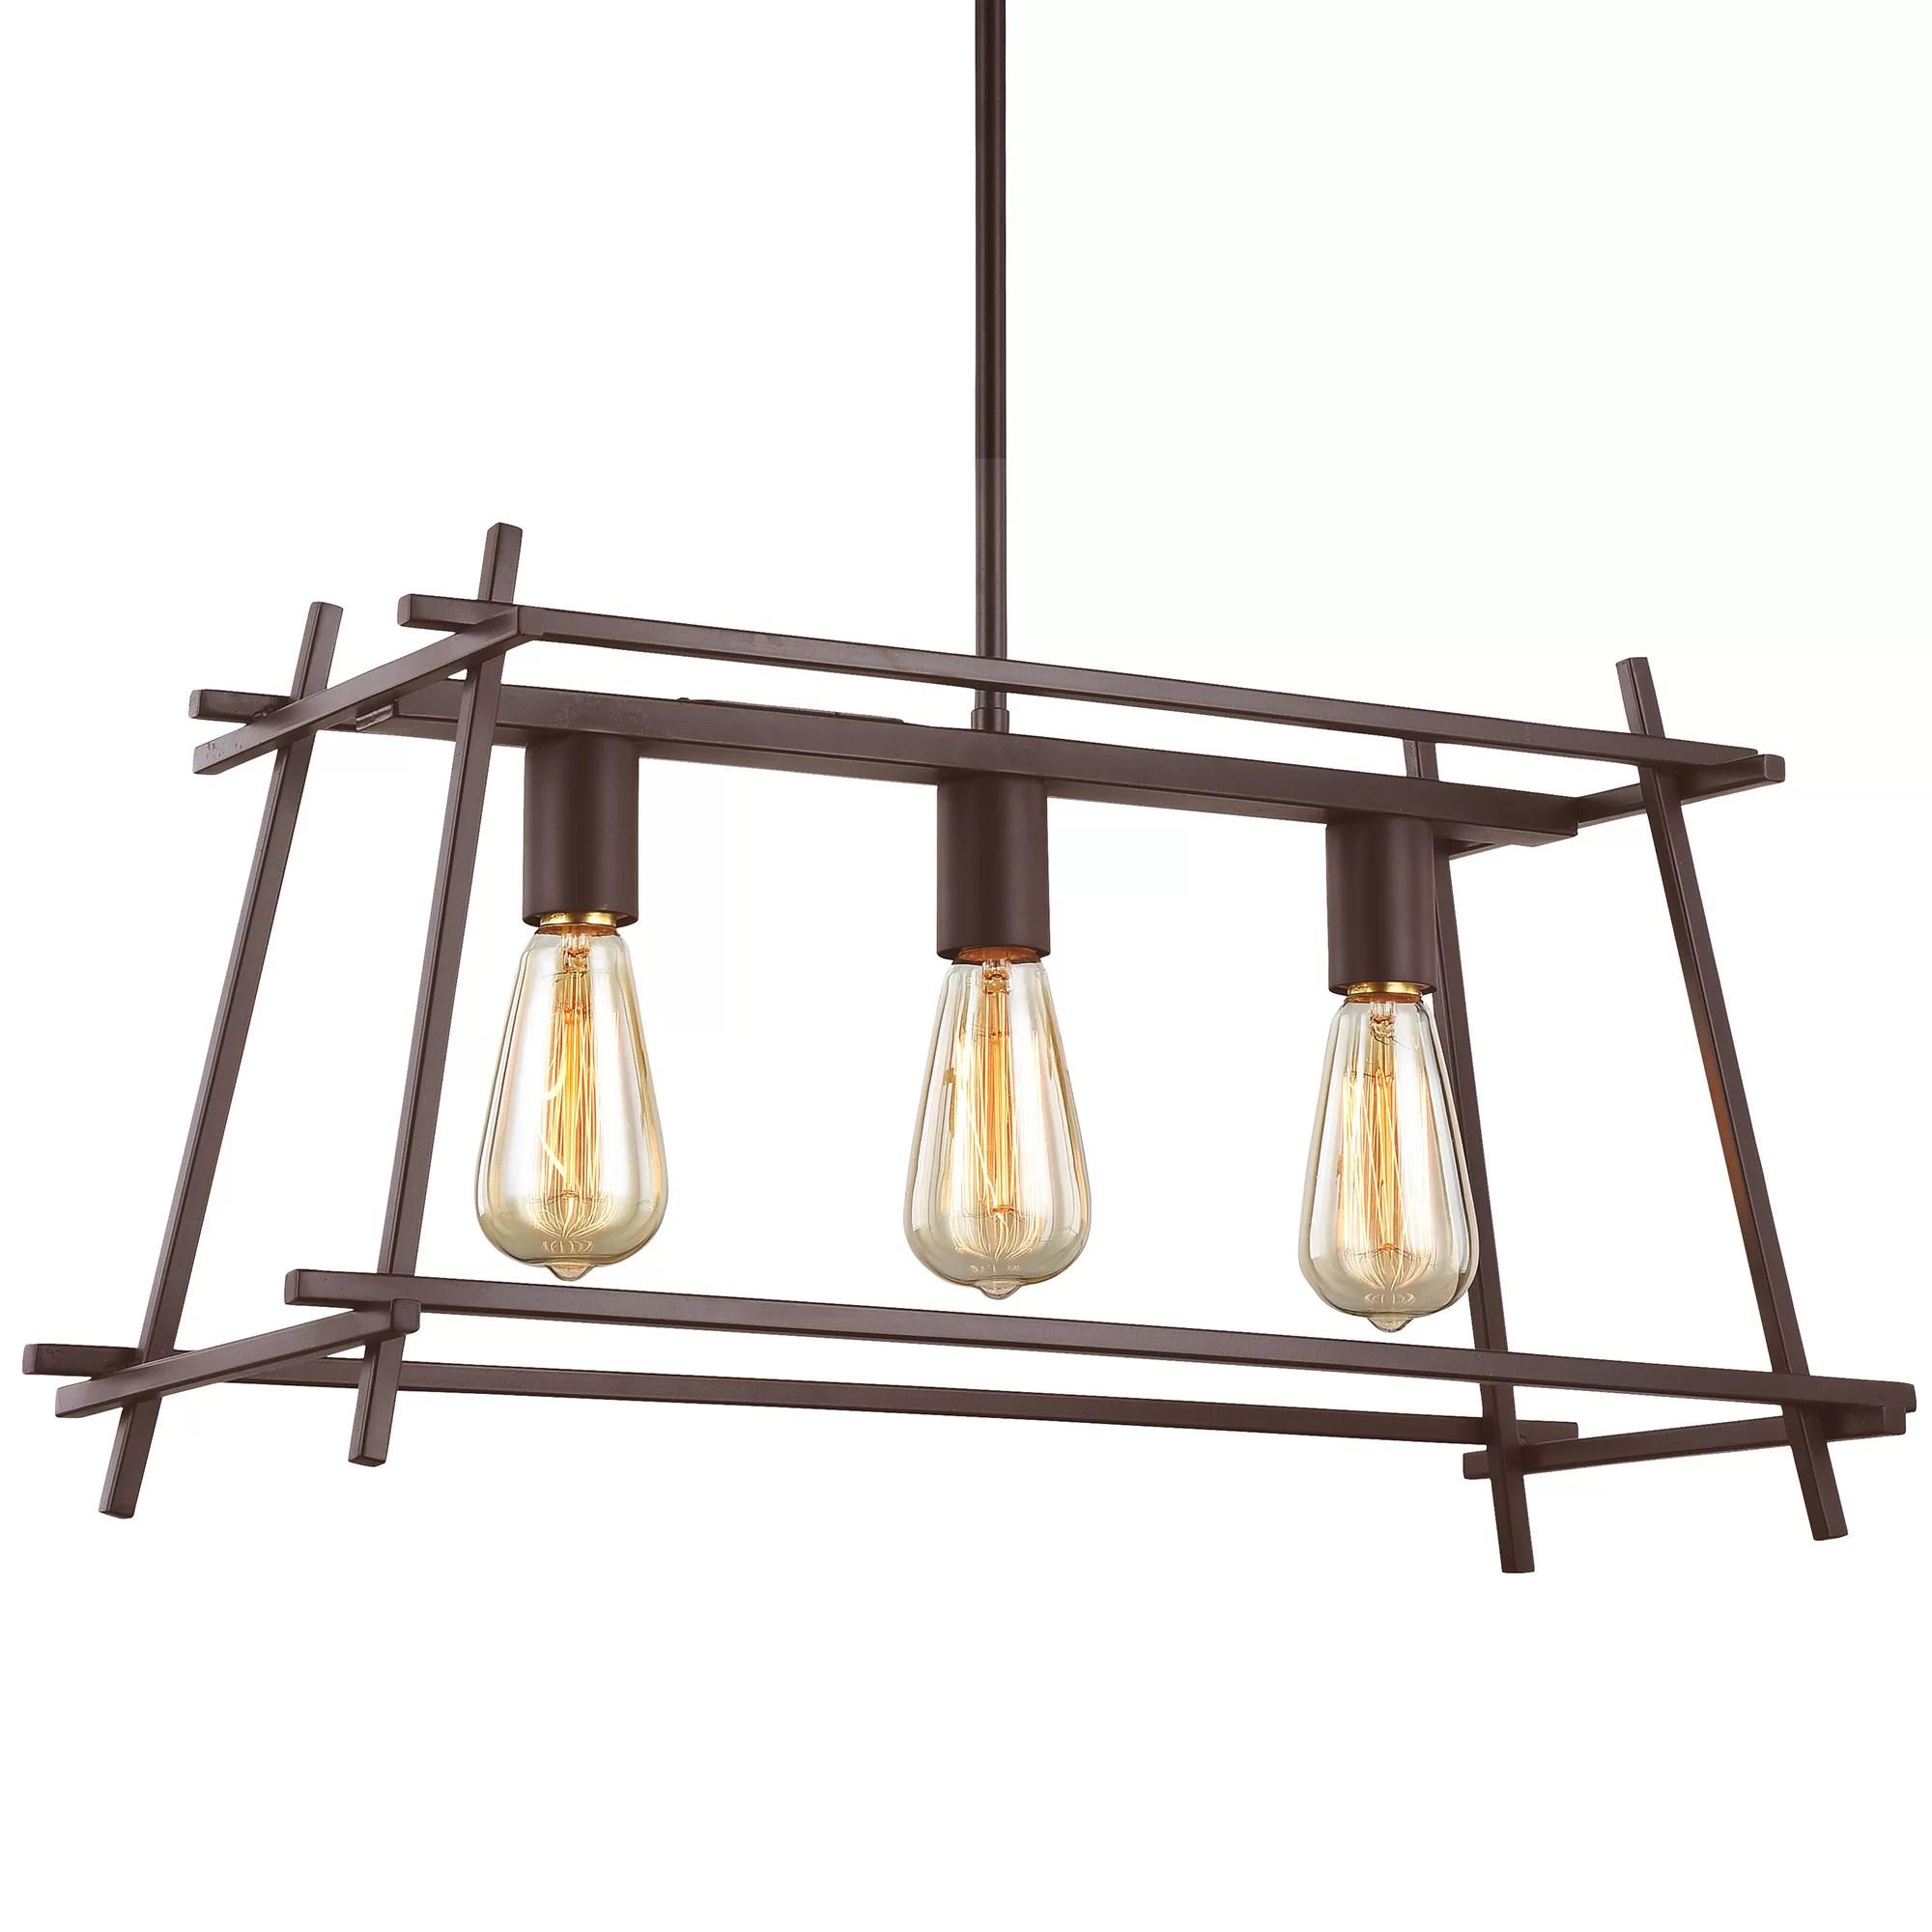 3 light kitchen island pendant drawer organizer ideas alternating current hashtag